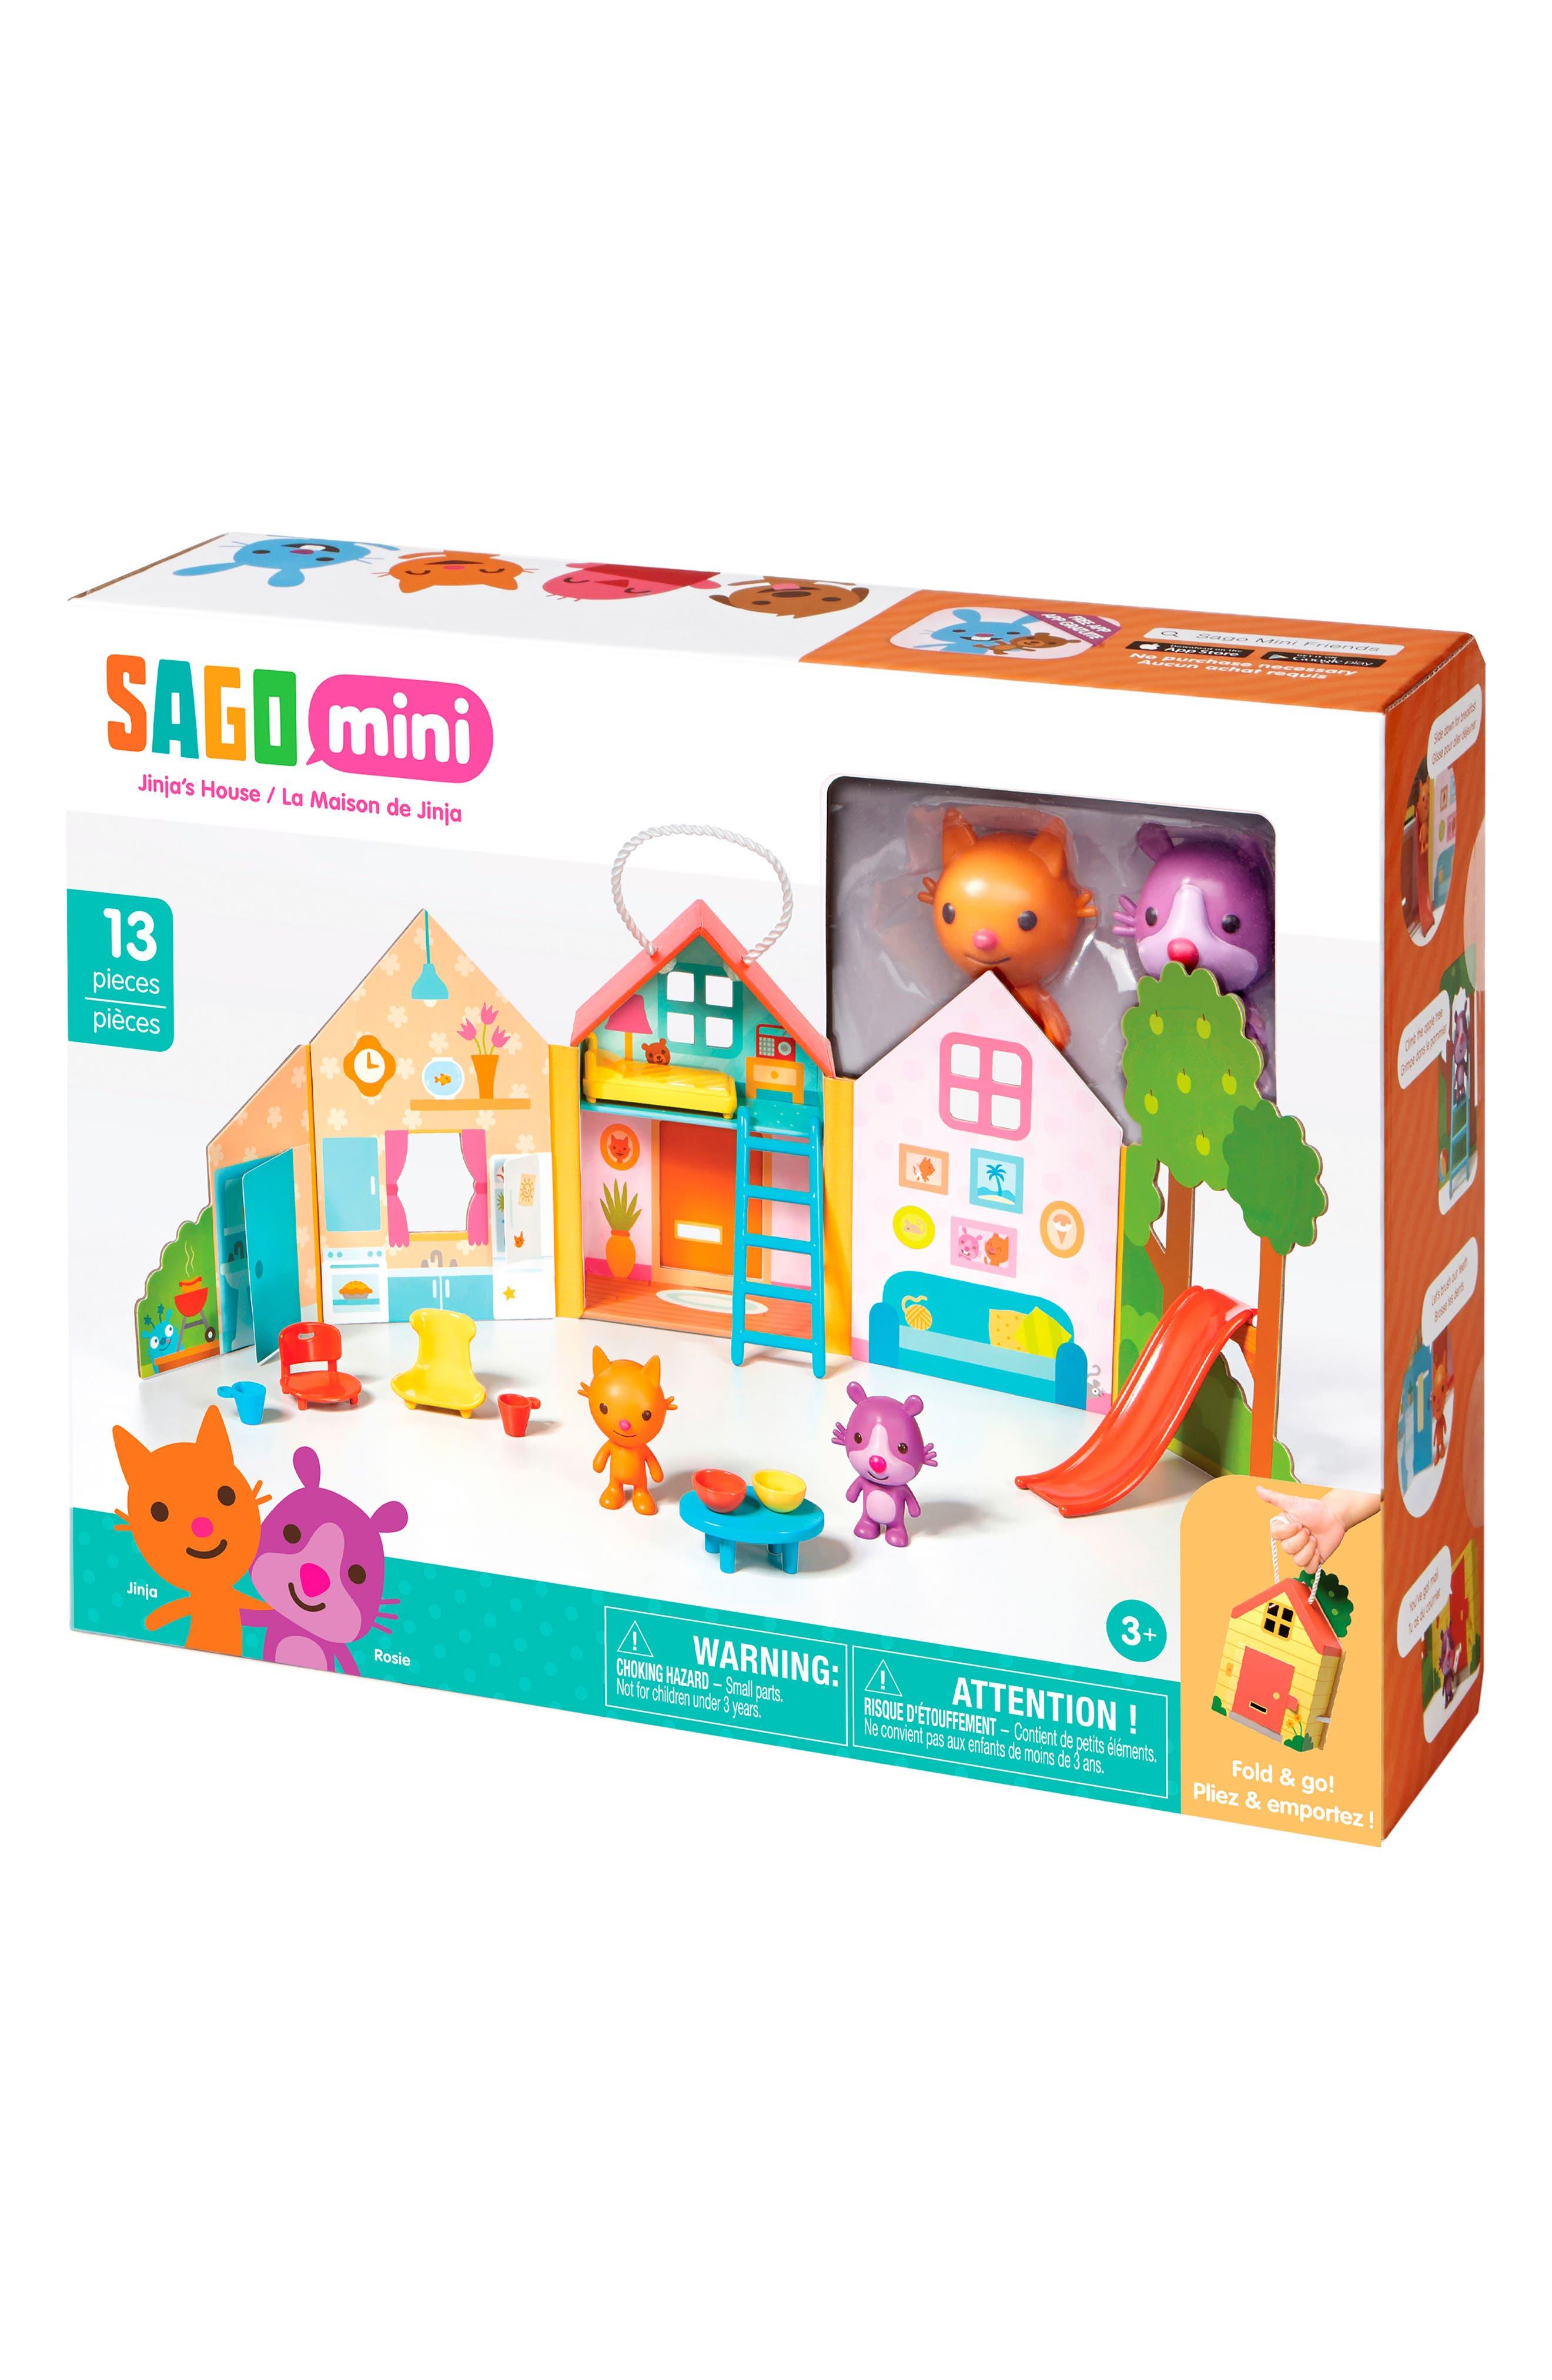 Sago Mini Jinja's House Portable Play Set